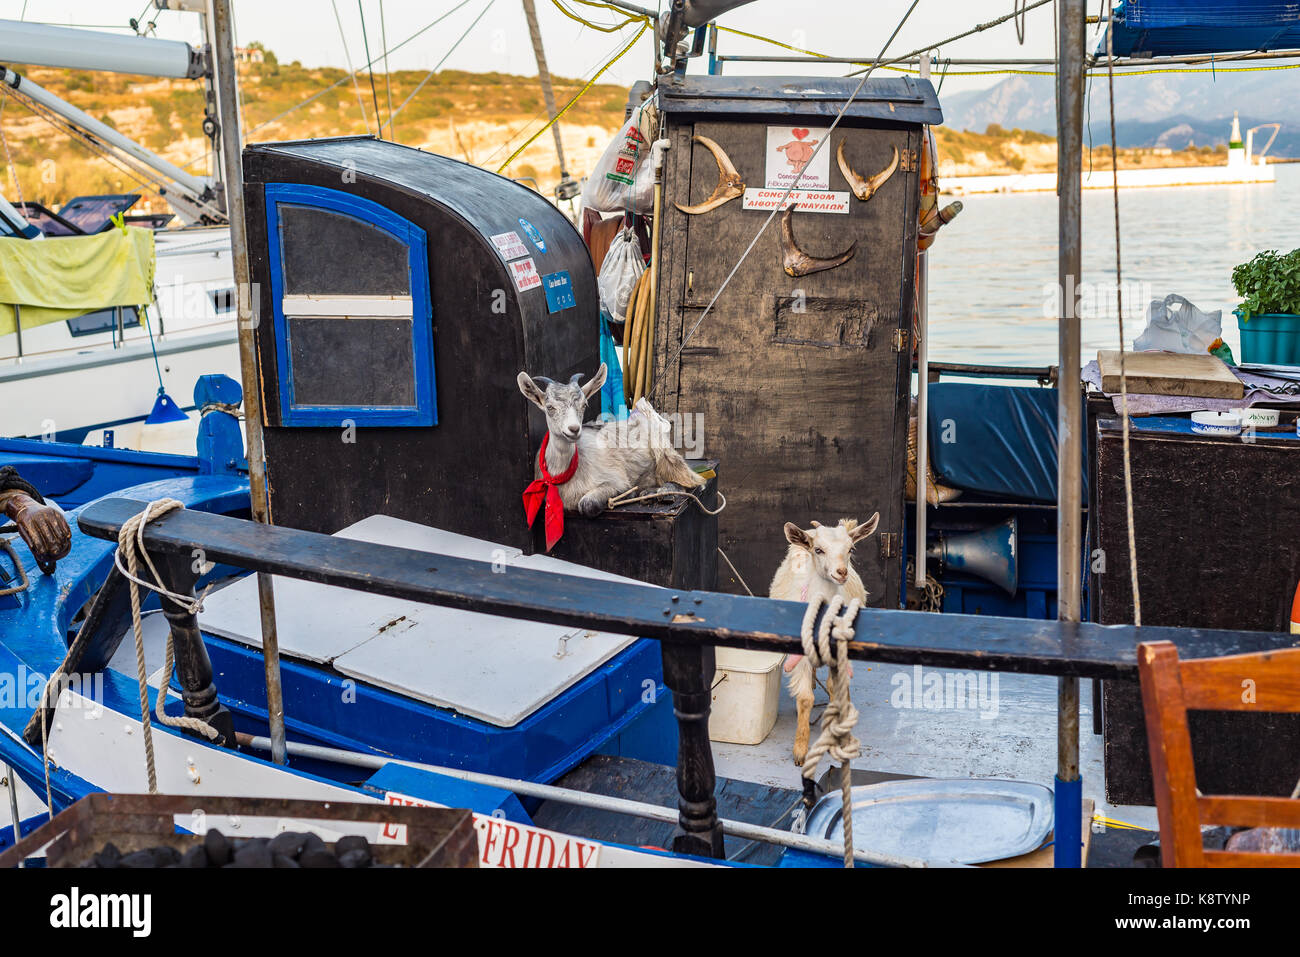 Samos island, Greece - September 18, 2016: Two goat on Fishing boat at Pythagorion/Pythagoreio Stock Photo